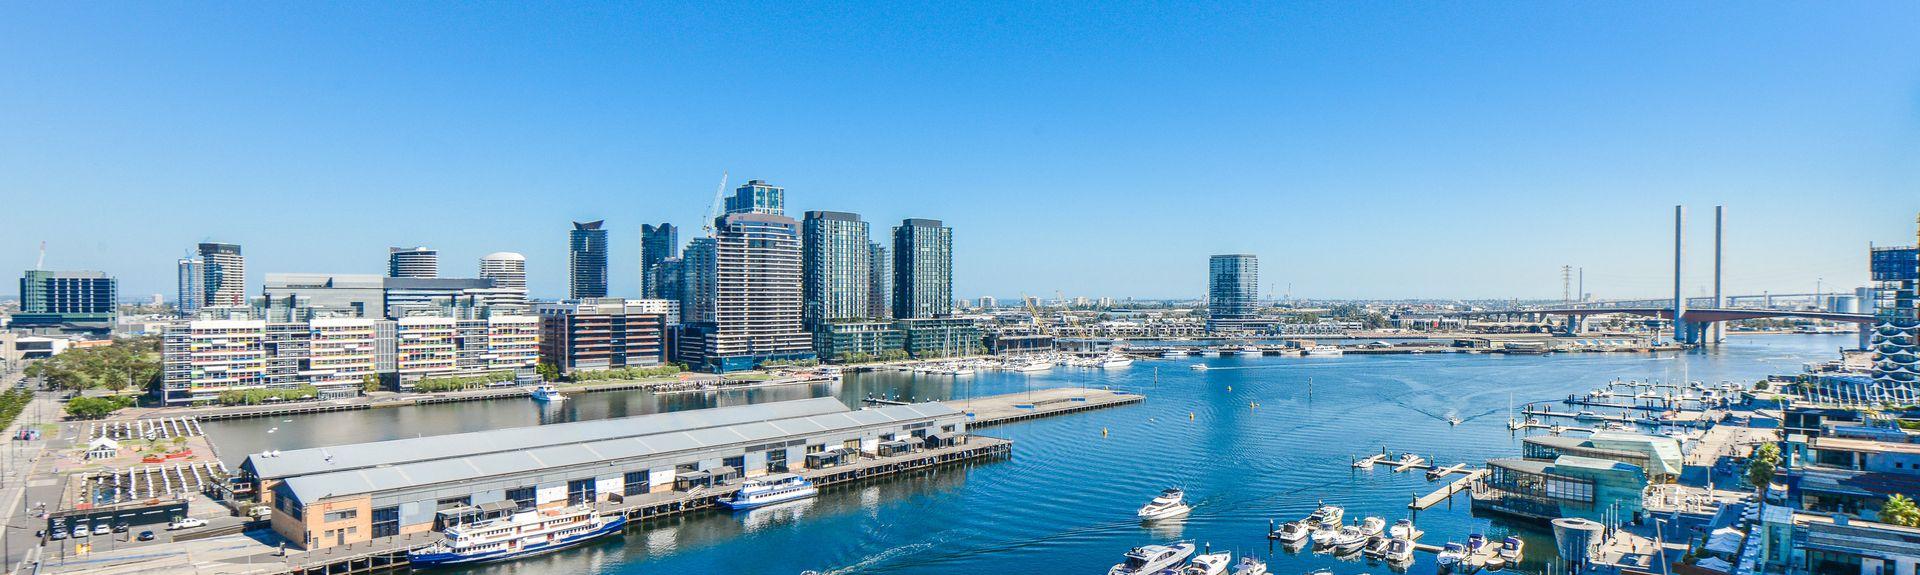 Docklands, Melbourne, Victoria, Australien